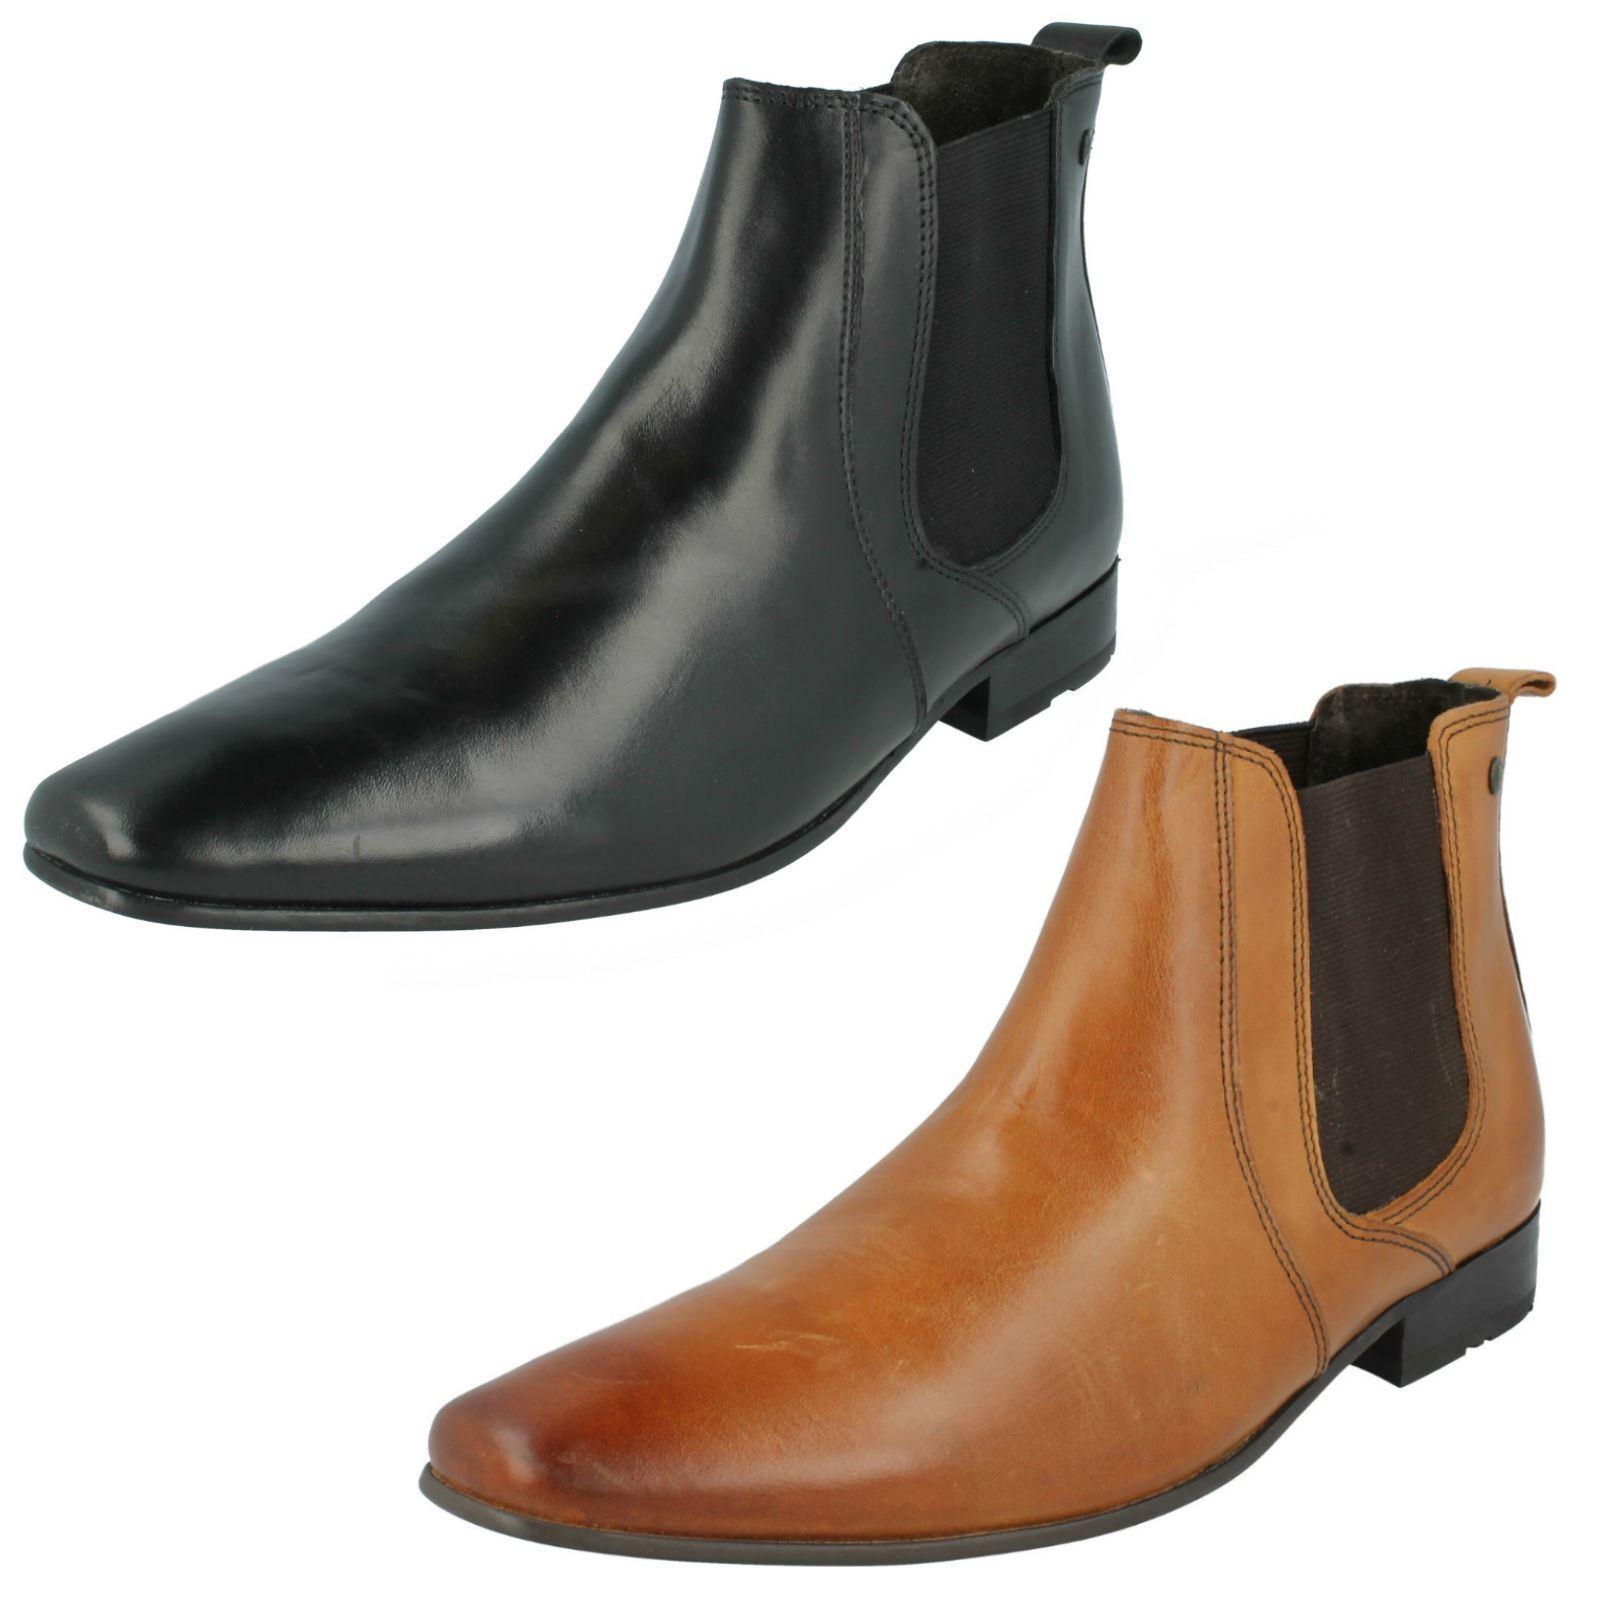 Herren Base London Hellbraun / schwarz Leather Stiefel Arthur